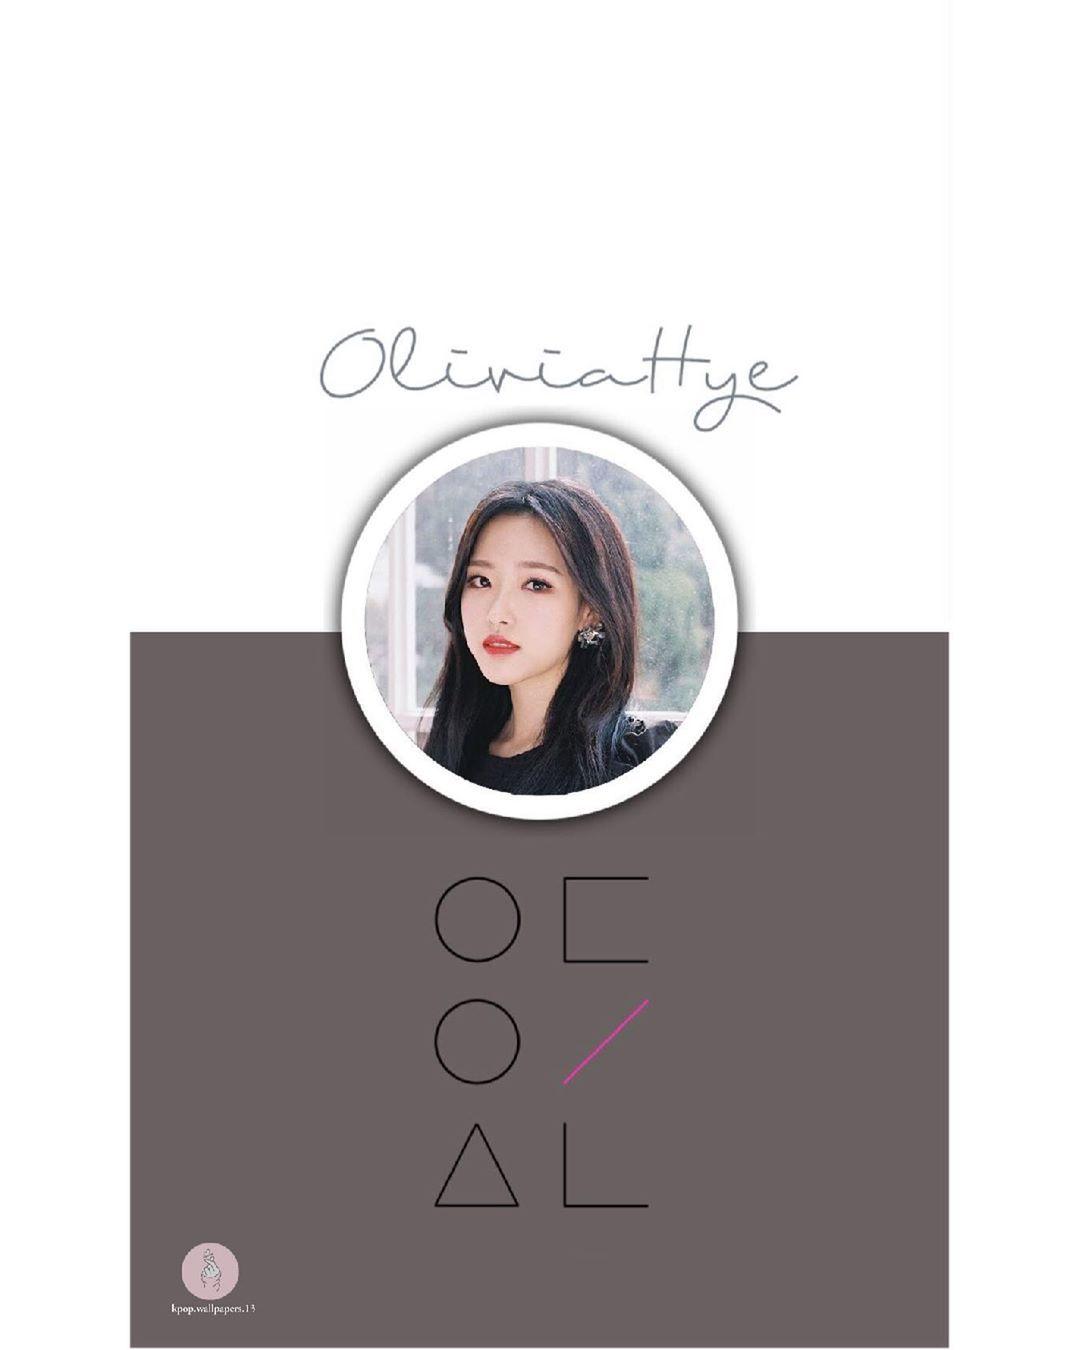 Kpop Wallpapers Edits On Instagram Loona Wallpaper Made By Kpop Wallpapers 13 Loona Gowon Stageoutfits Flylikabutte Kpop Wallpaper Wallpaper Instagram